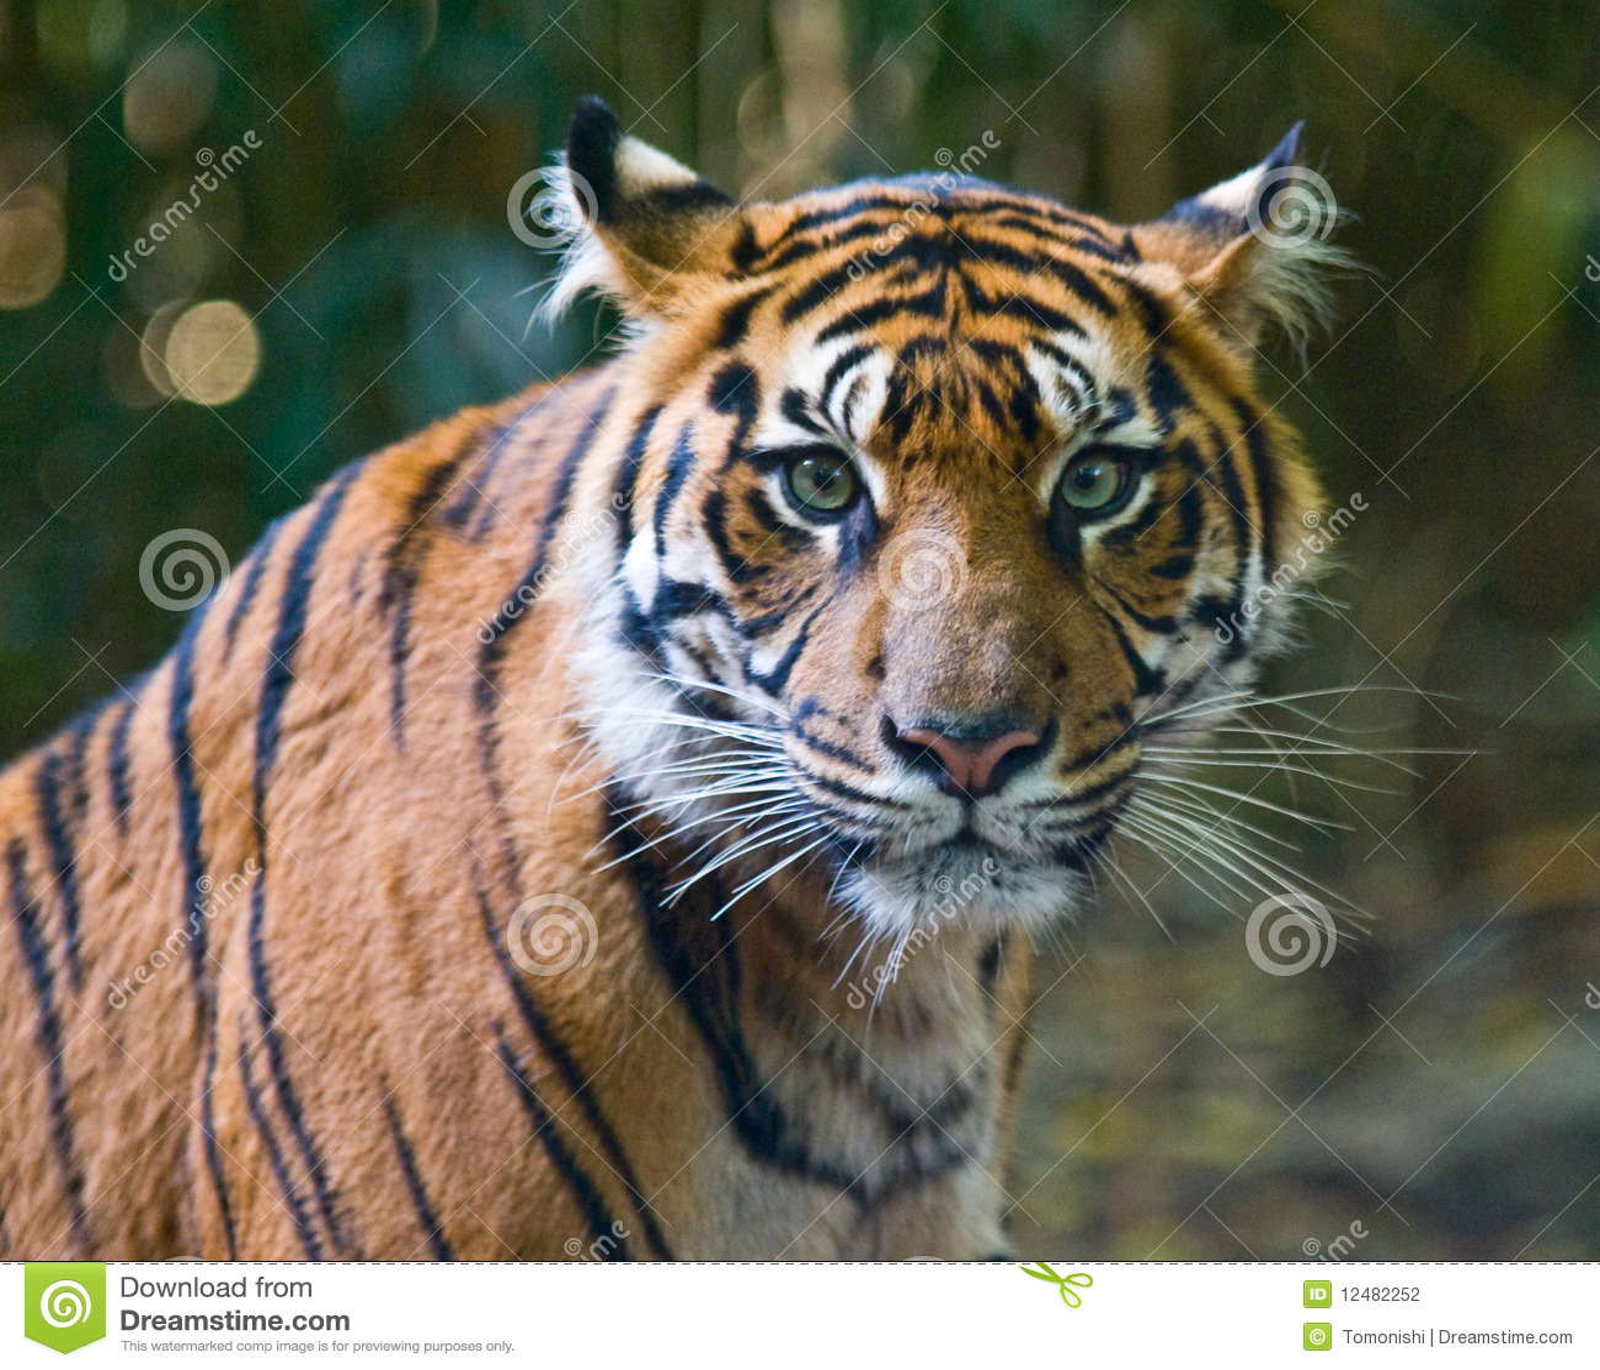 Green tiger eyes - photo#10